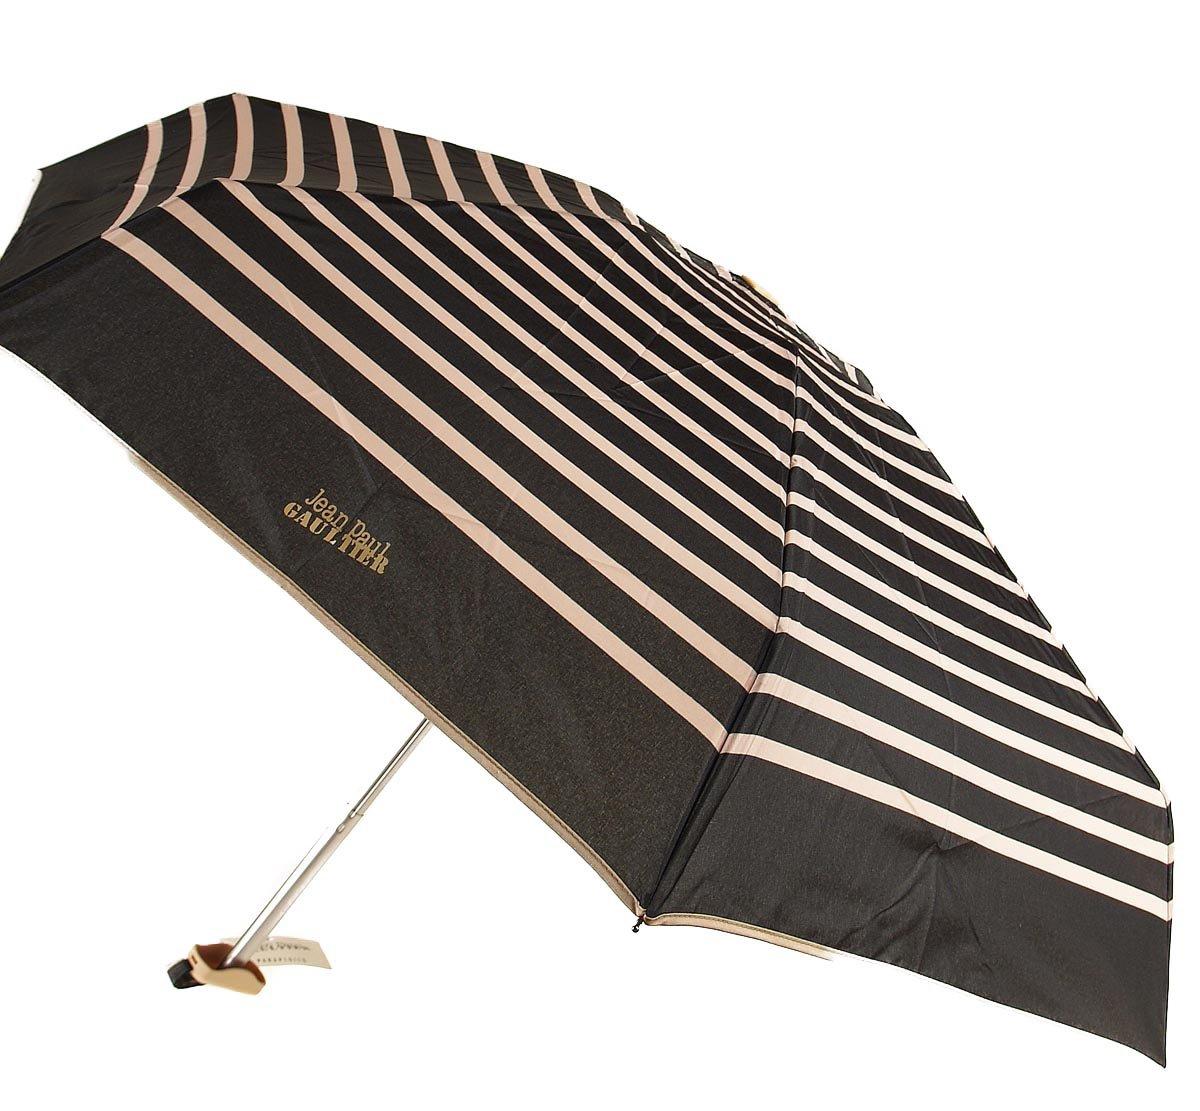 Parapluies Jean-Paul Gaultier - Paraguas plegable amarillento micro rayas: Amazon.es: Equipaje